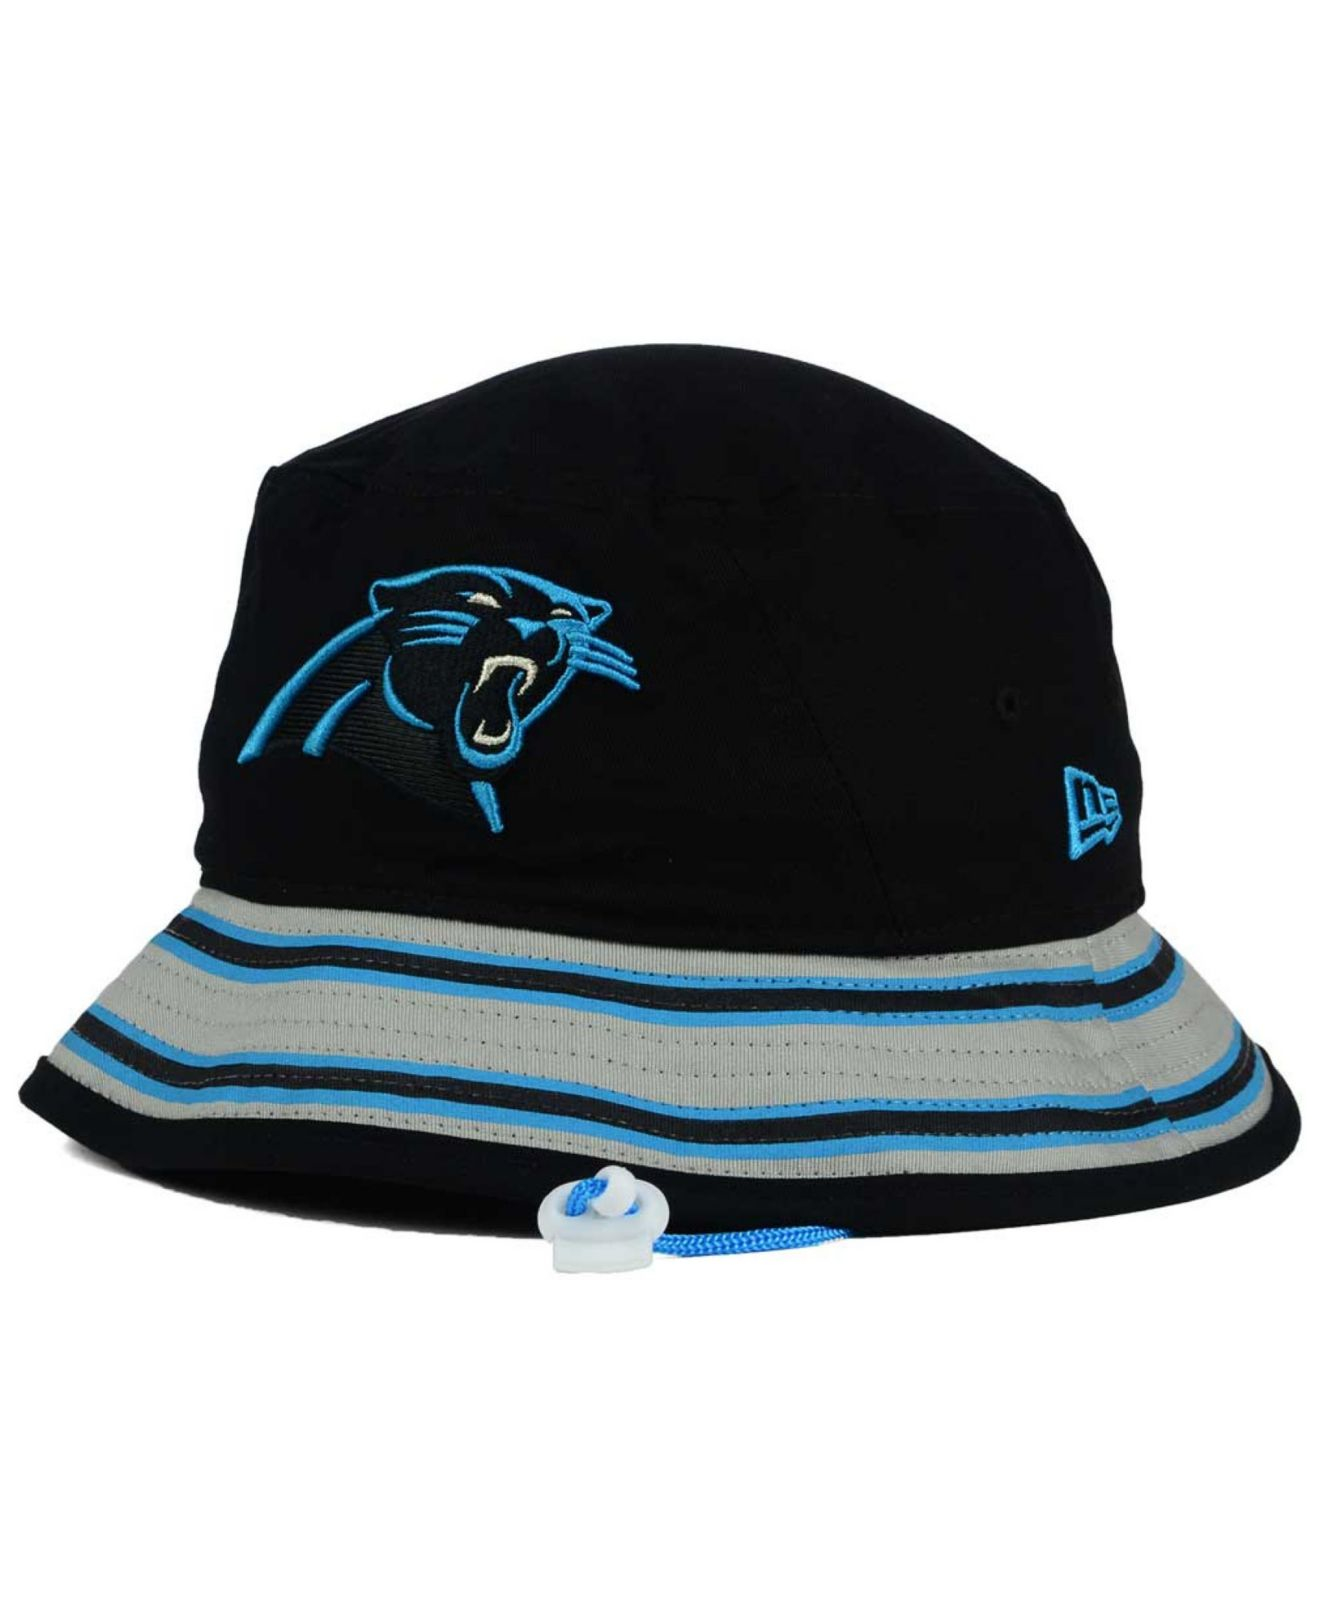 newest 8f855 3332f ... greece lyst ktz carolina panthers team stripe bucket hat in blue for  men c335d b4ef6